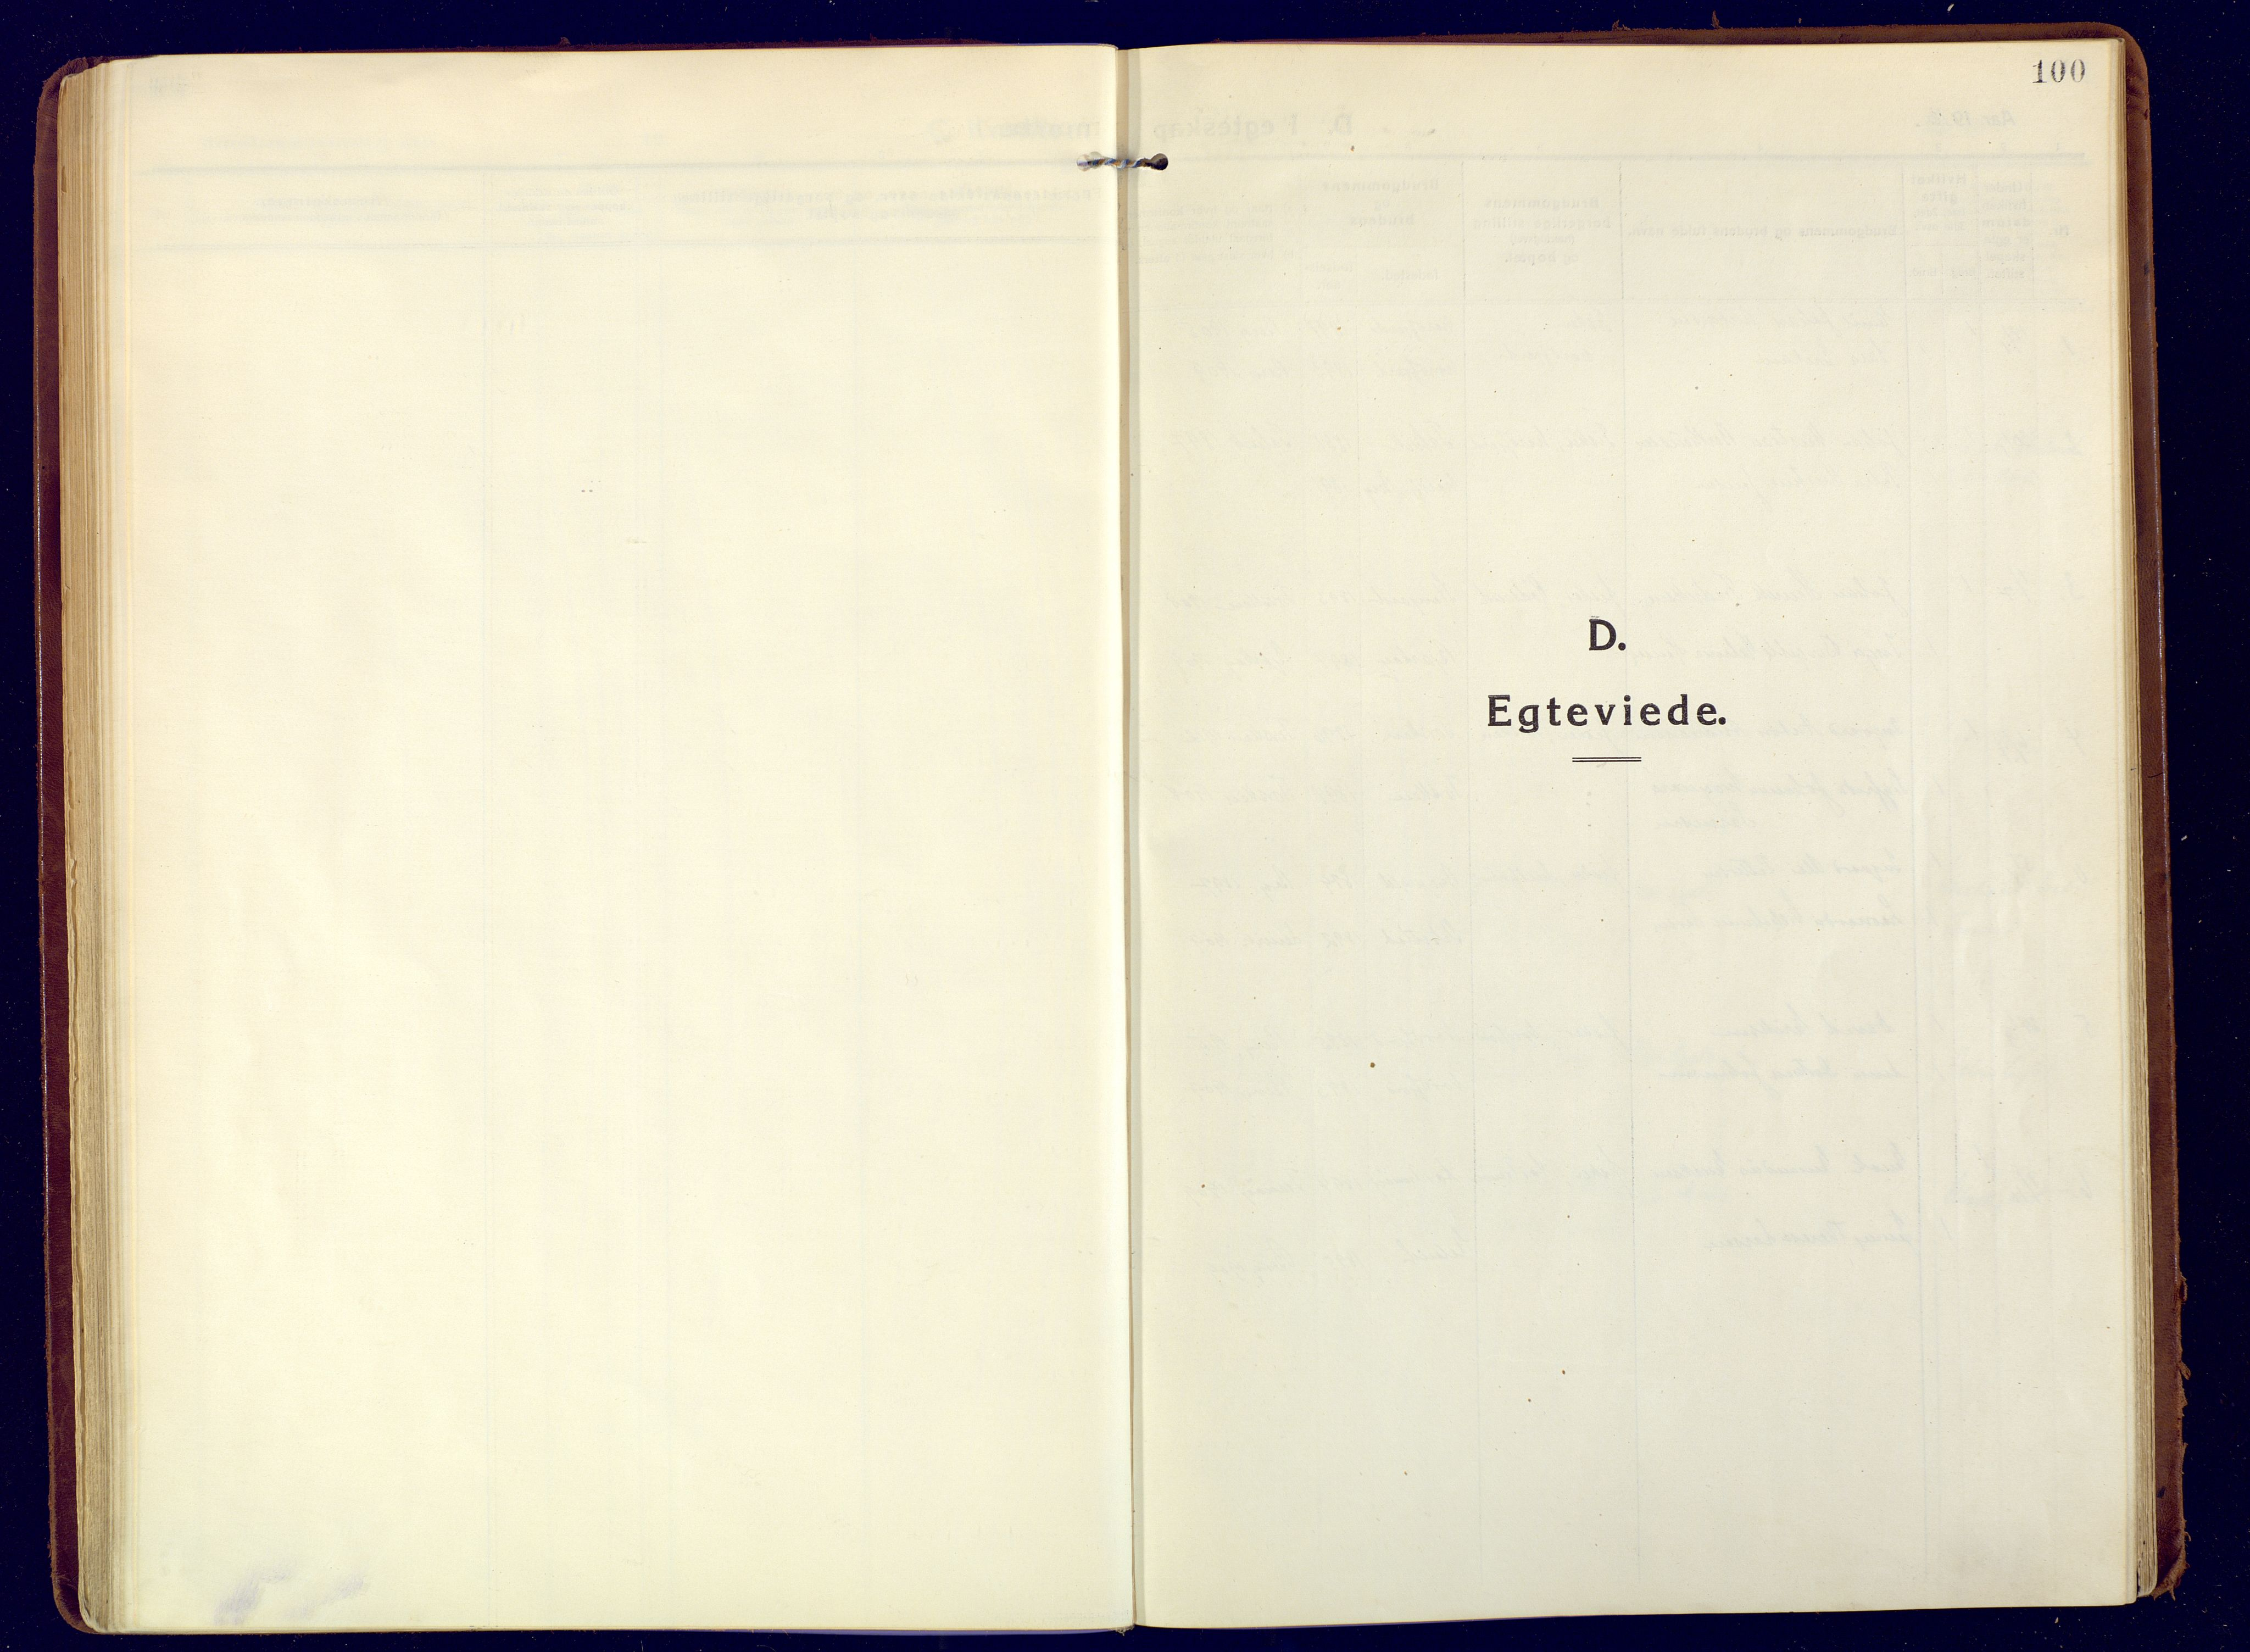 SATØ, Mefjord/Berg sokneprestkontor, G/Ga/Gaa: Ministerialbok nr. 9, 1916-1928, s. 100